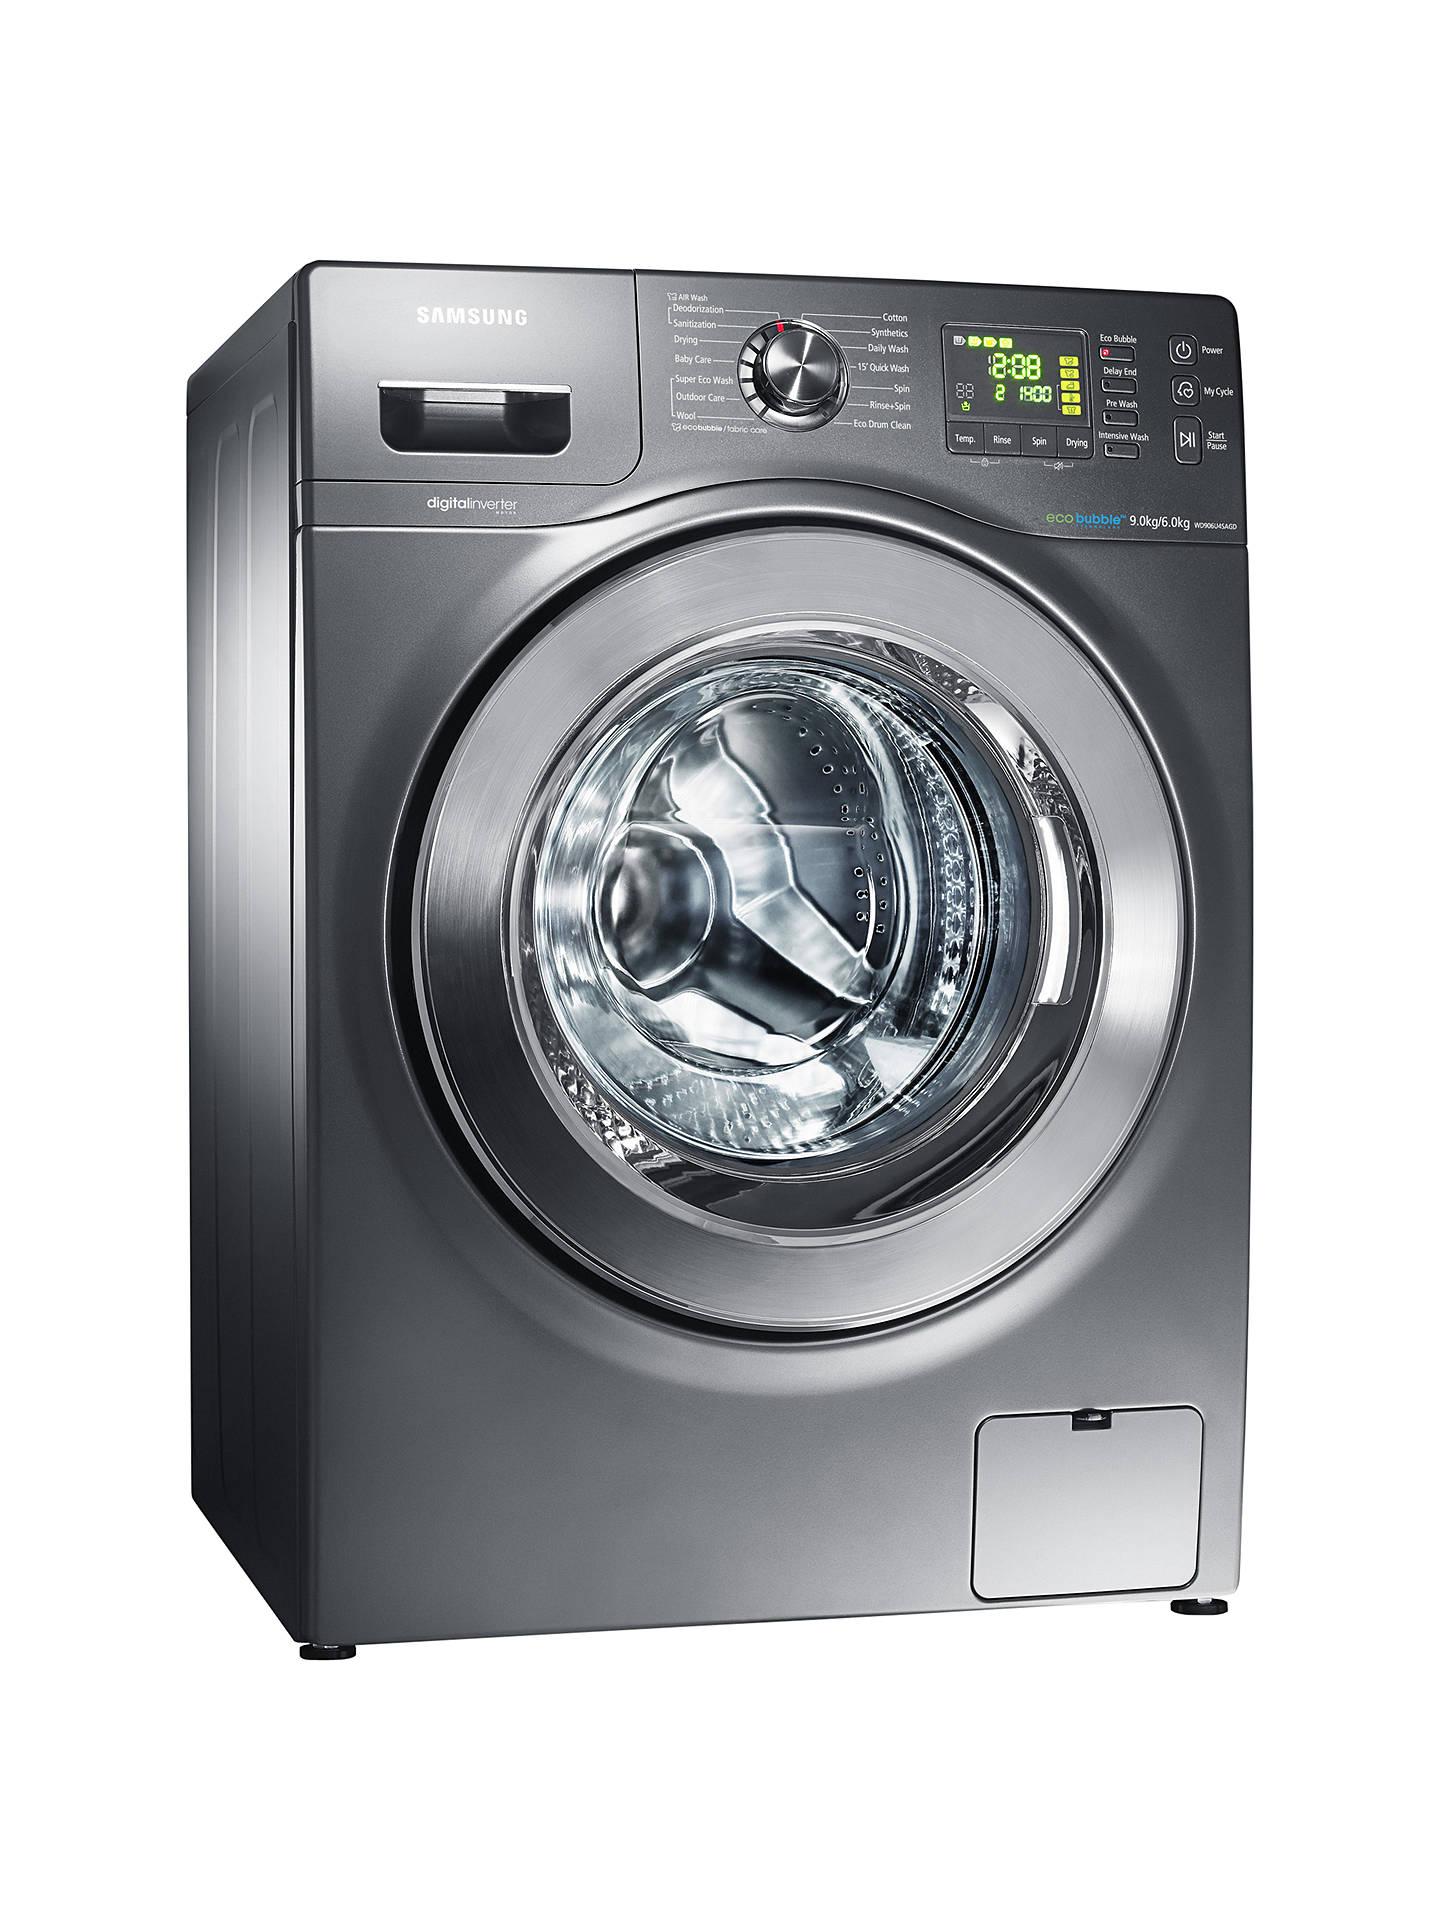 Samsung WD906U4SAGD Washer Dryer, 9kg Wash / 6kg Dry Load, A Energy